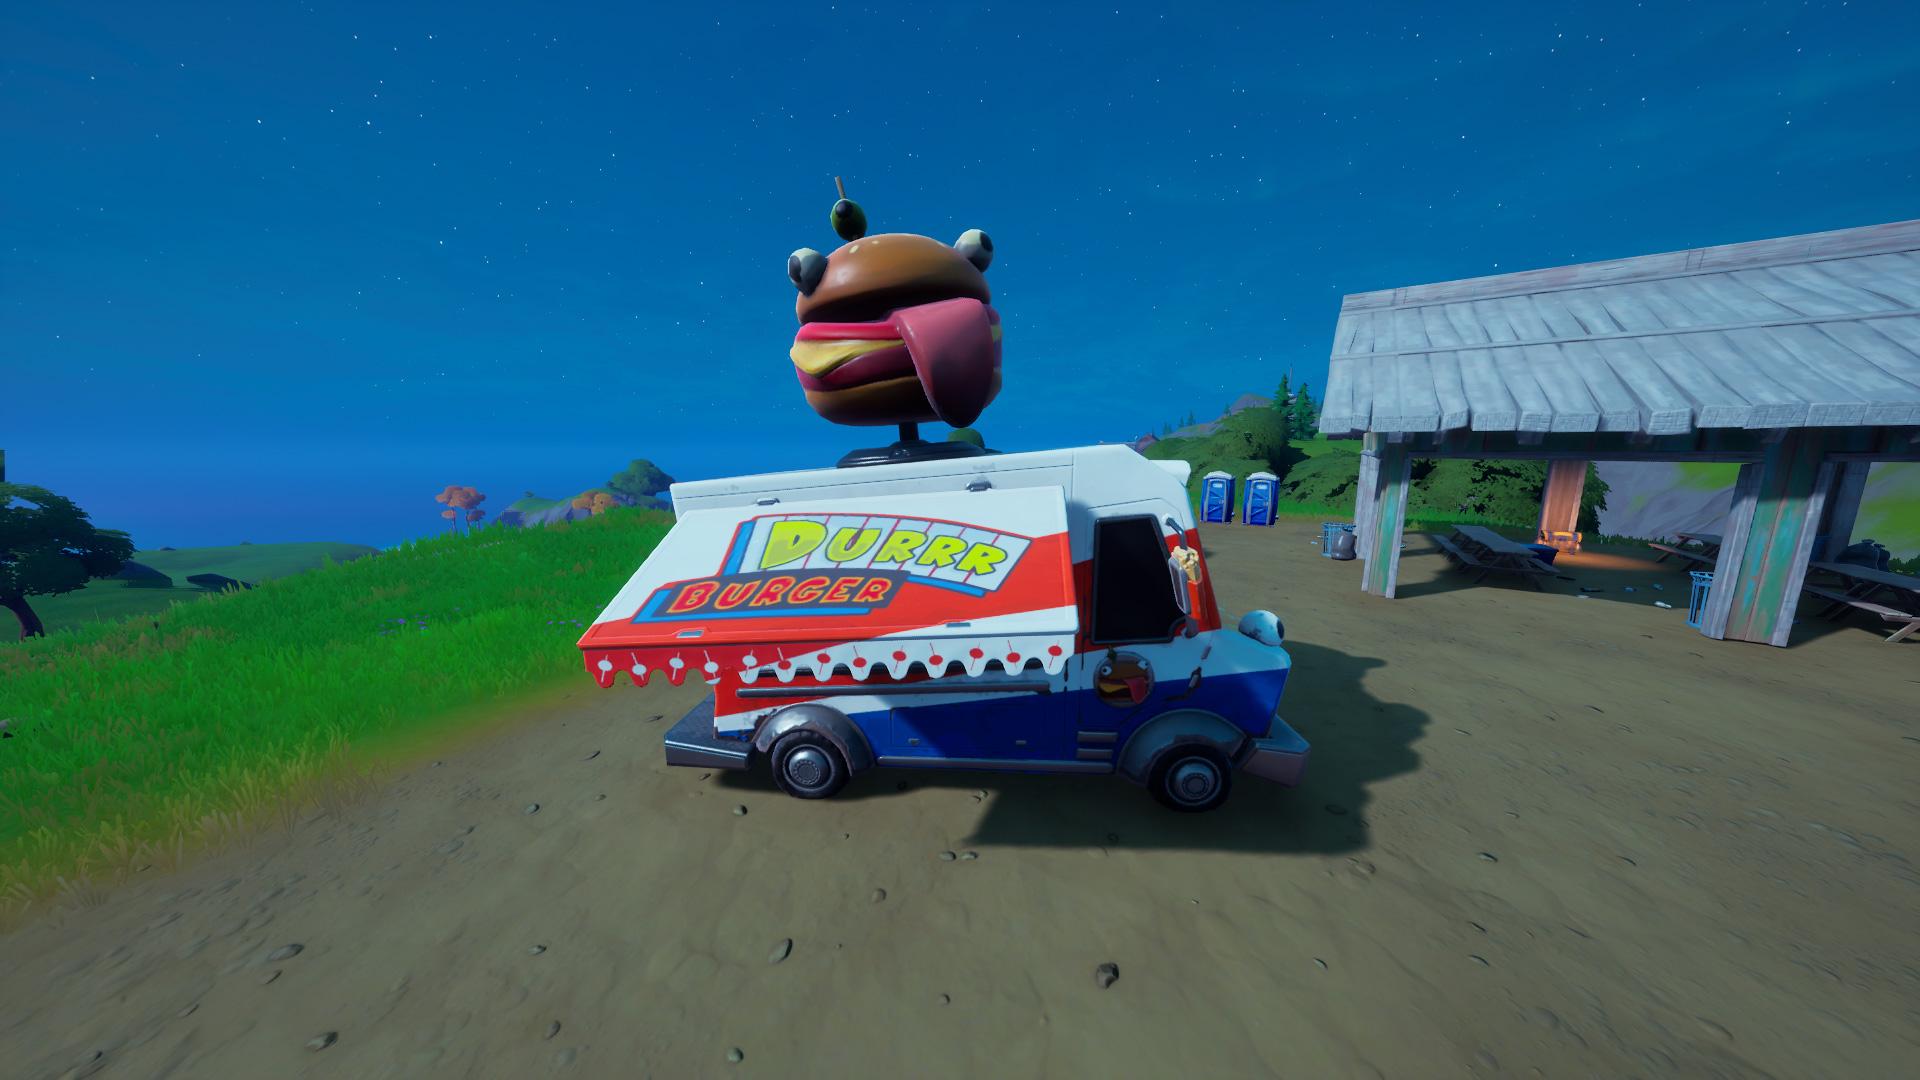 Durr Burger Food Truck Location Fortnite Chapter 2 Saison 5